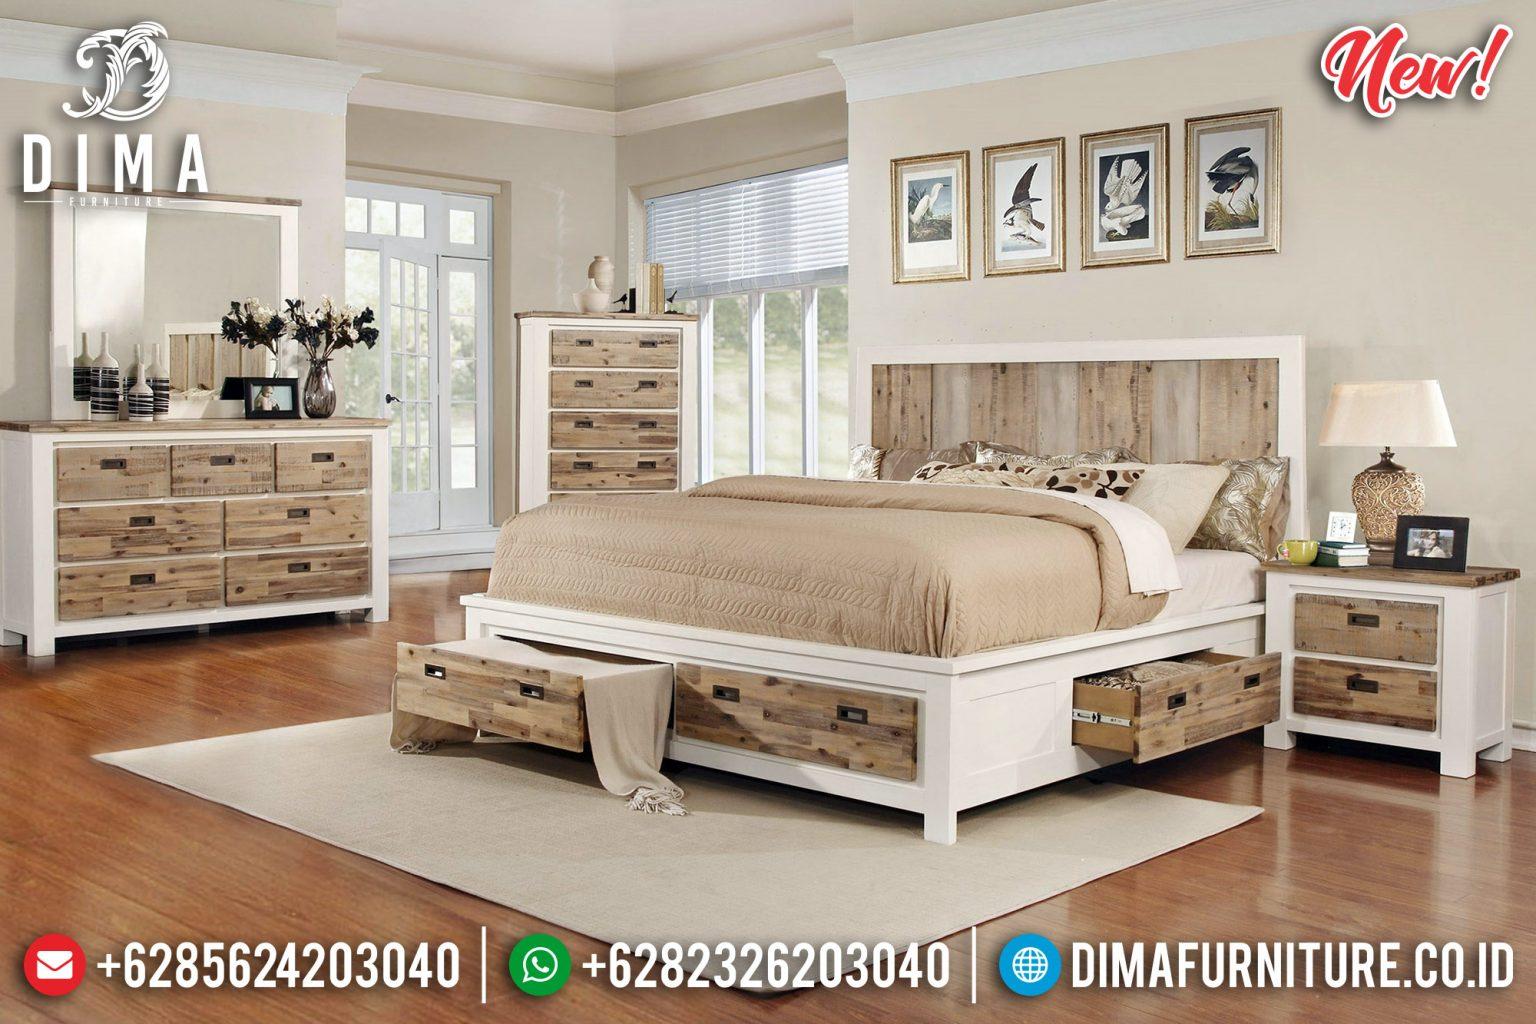 Tempat Tidur Minimalis Type Laci 2020 TTJ-0066